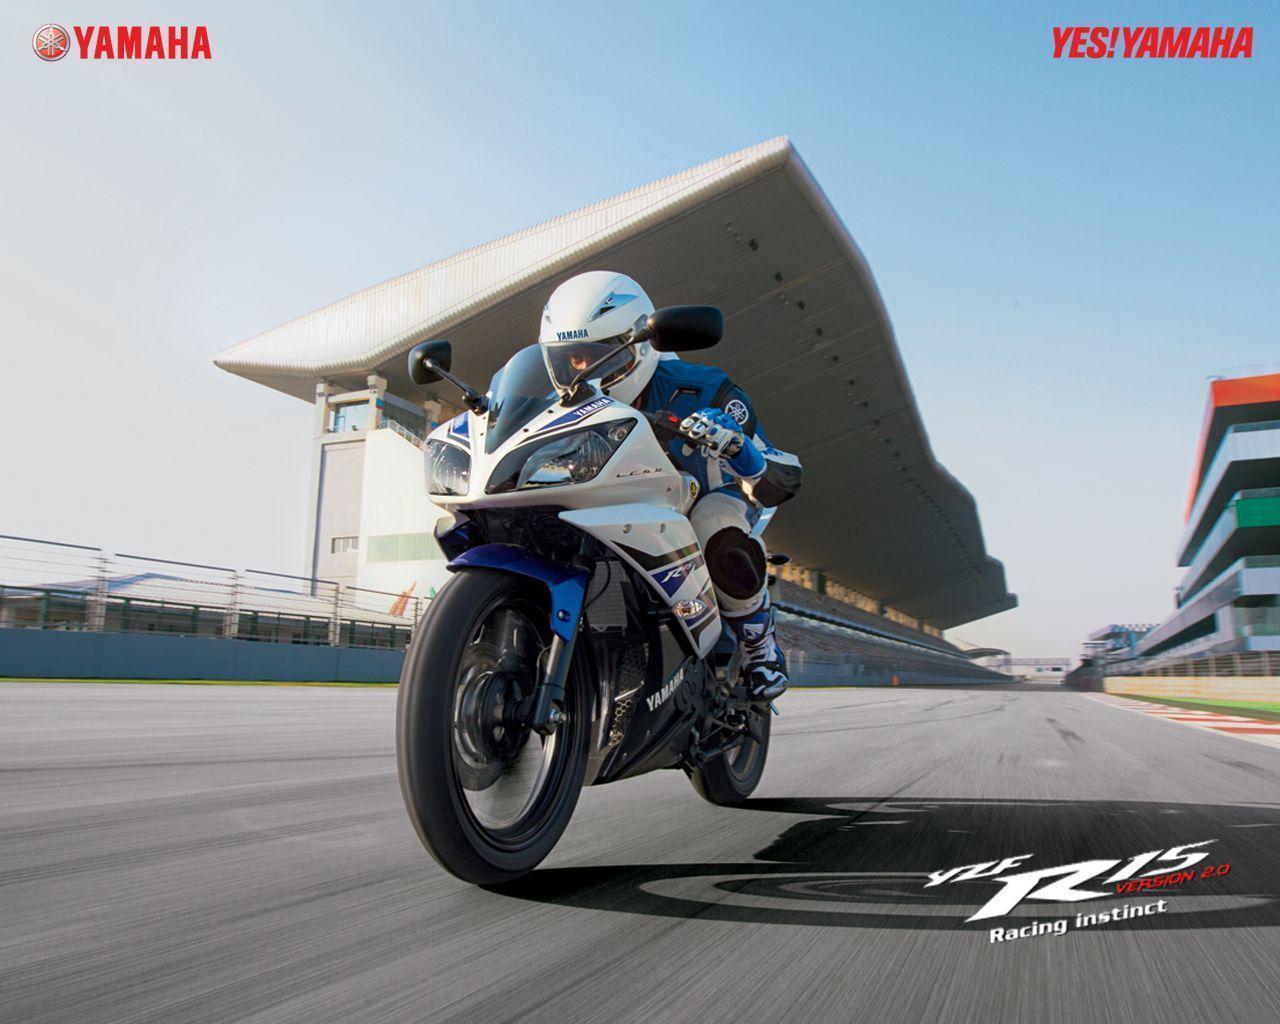 Yamaha YZF-R15 Wallpapers - Wallpaper Cave